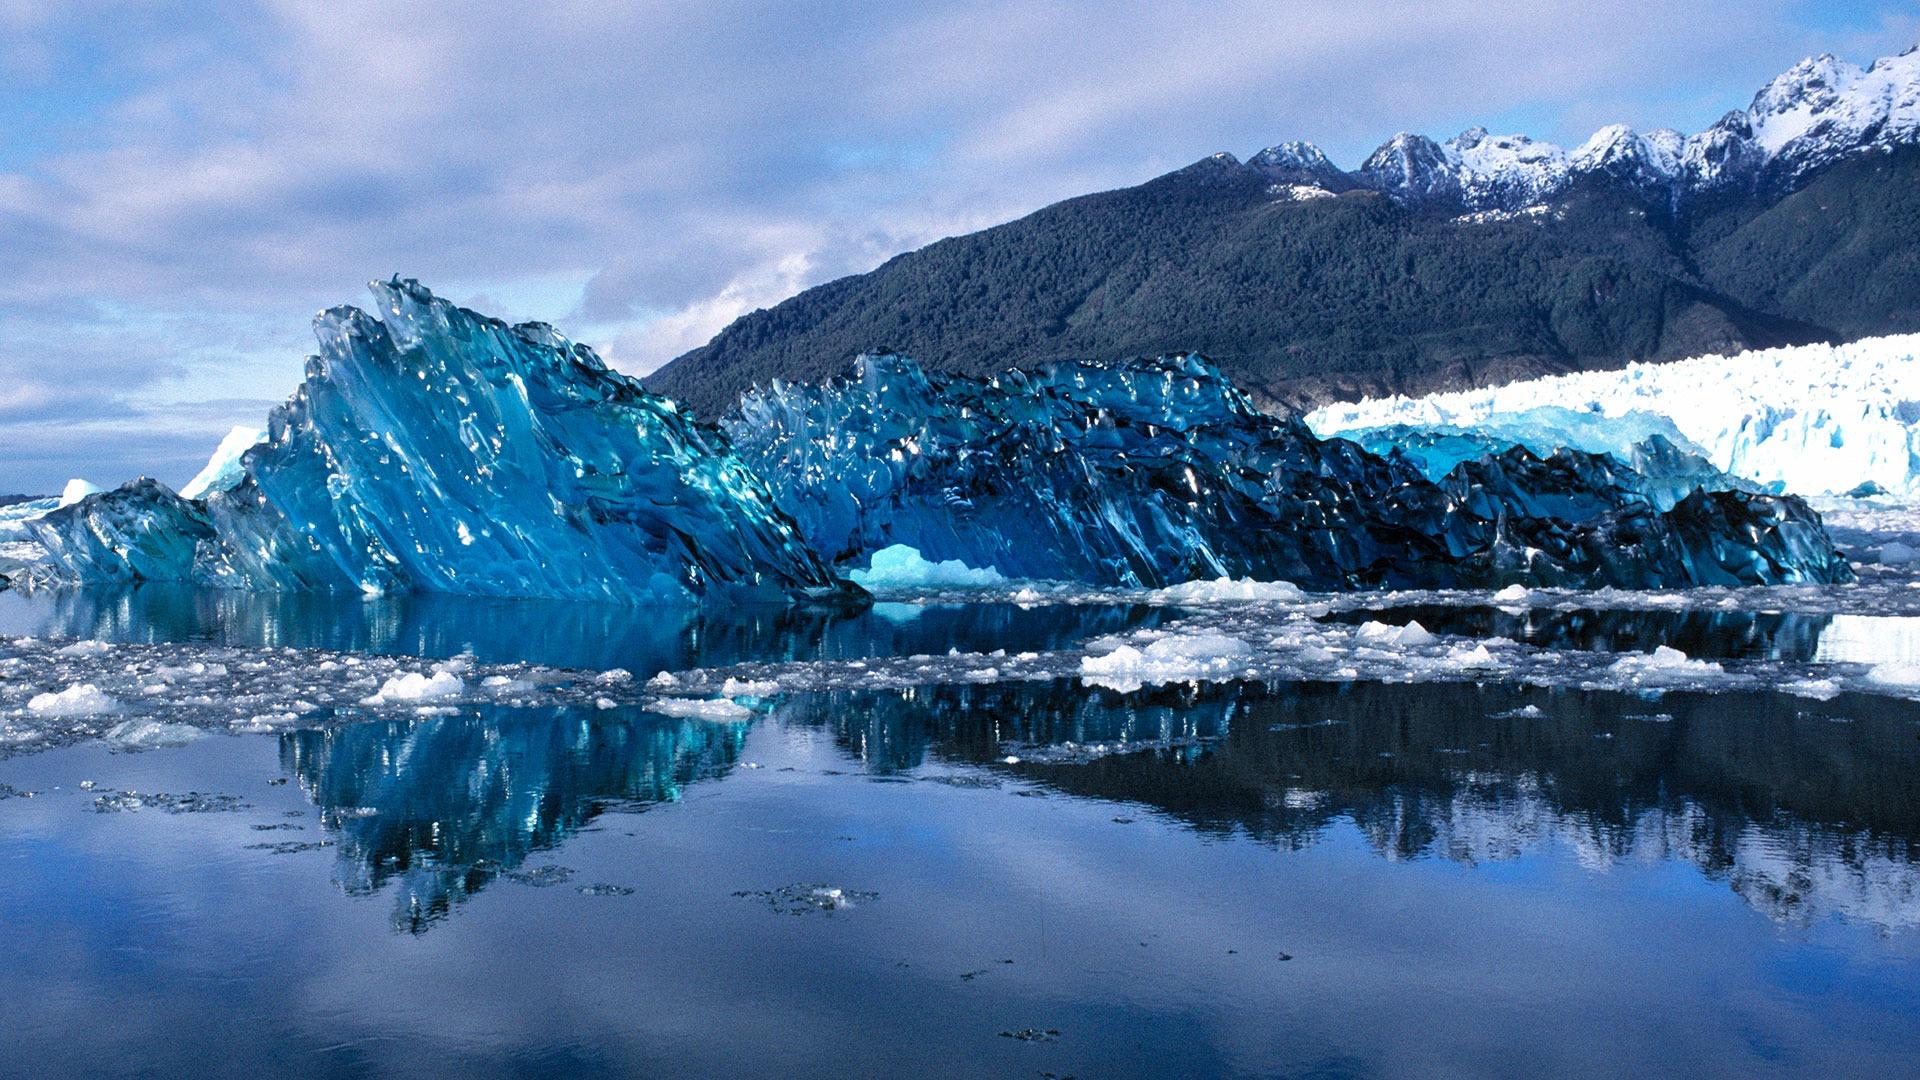 Newly-calved iceberg in Laguna San Rafael Lagoon National Park, Chile